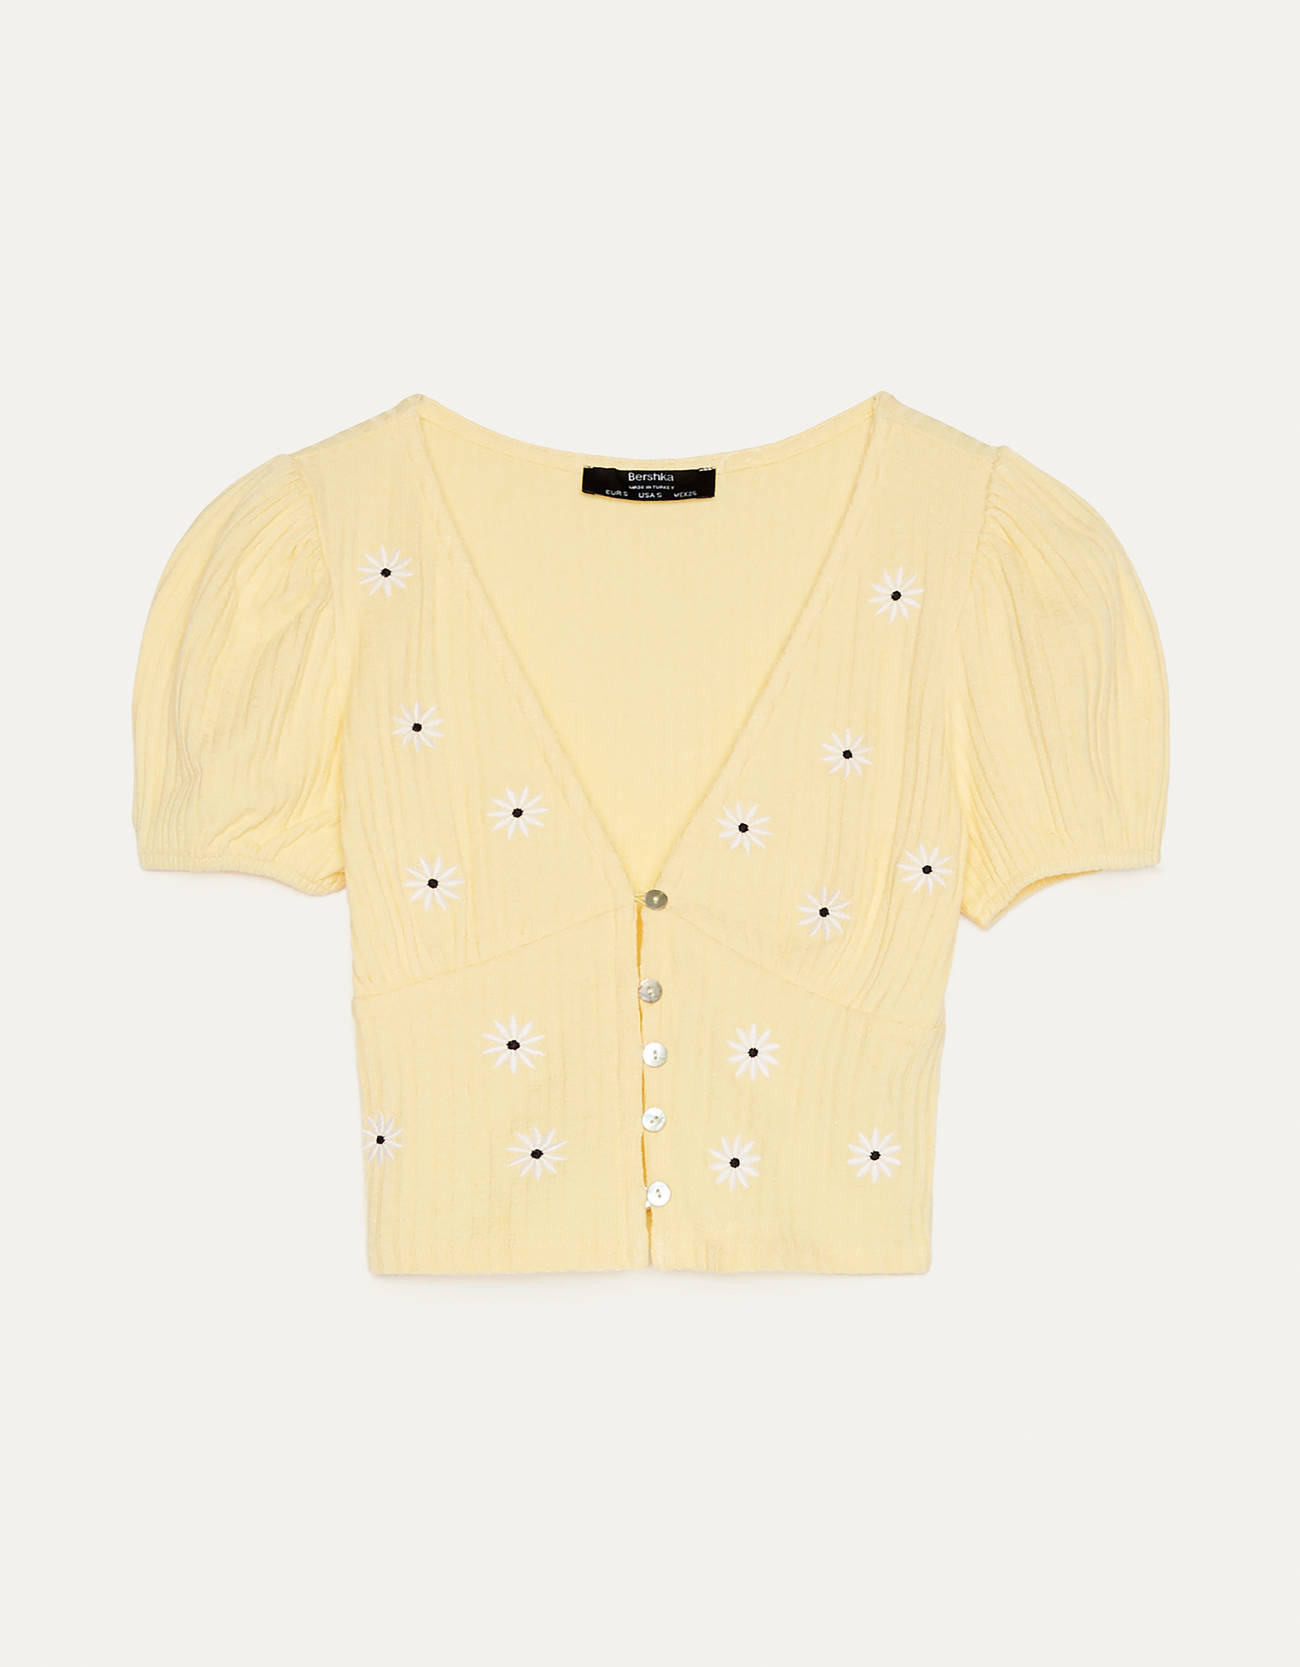 Camiseta con bordado de margaritas.